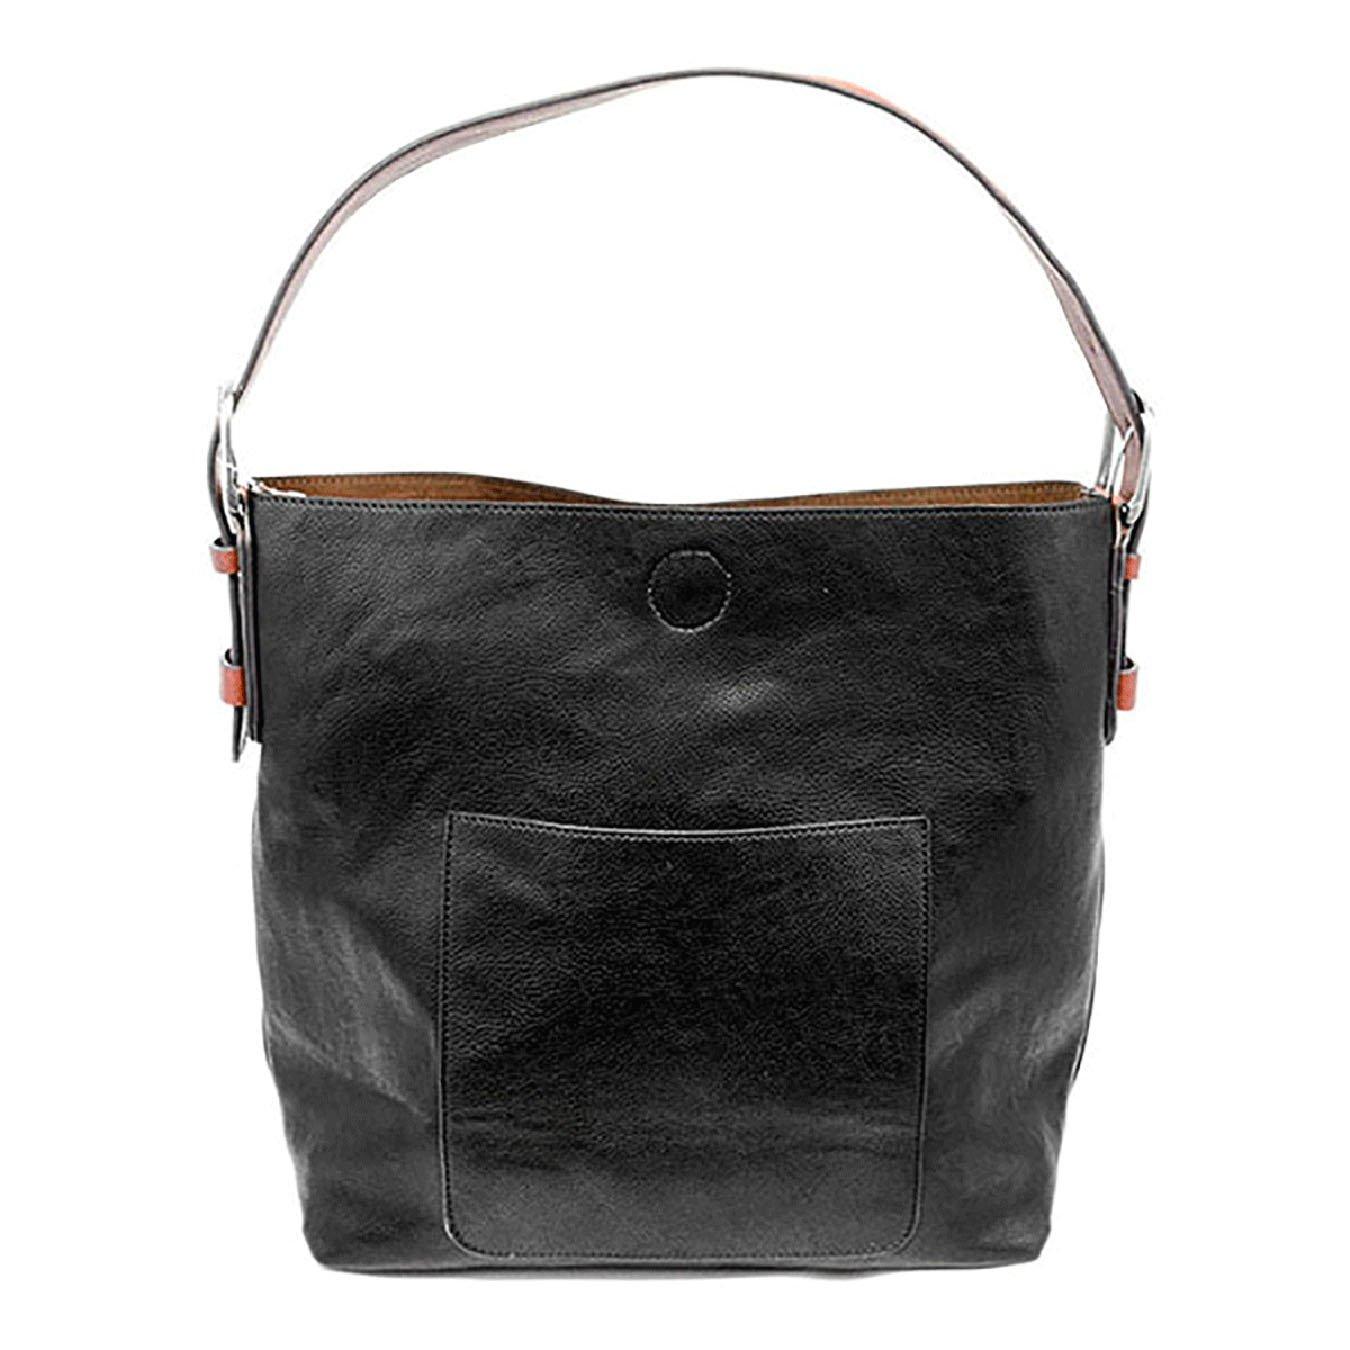 Black- Cedar Handle Hobo Handbag